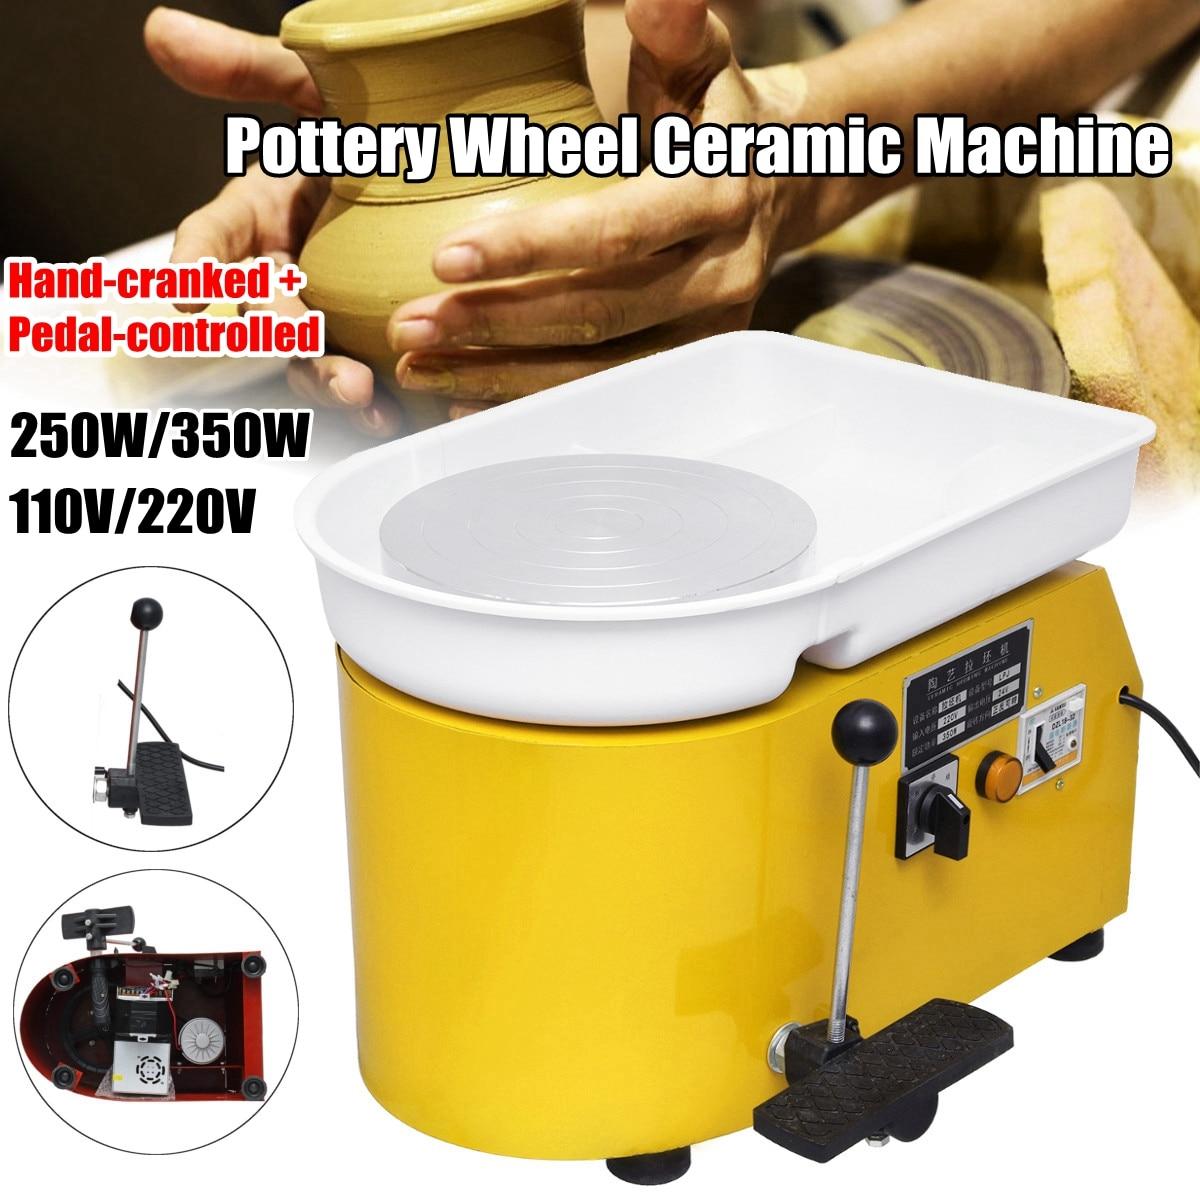 110 v/220 v Keramik Forming Maschine 250 watt/350 watt Elektrische Keramik Rad DIY Ton Werkzeug mit tablett Für Keramik Arbeit Keramik